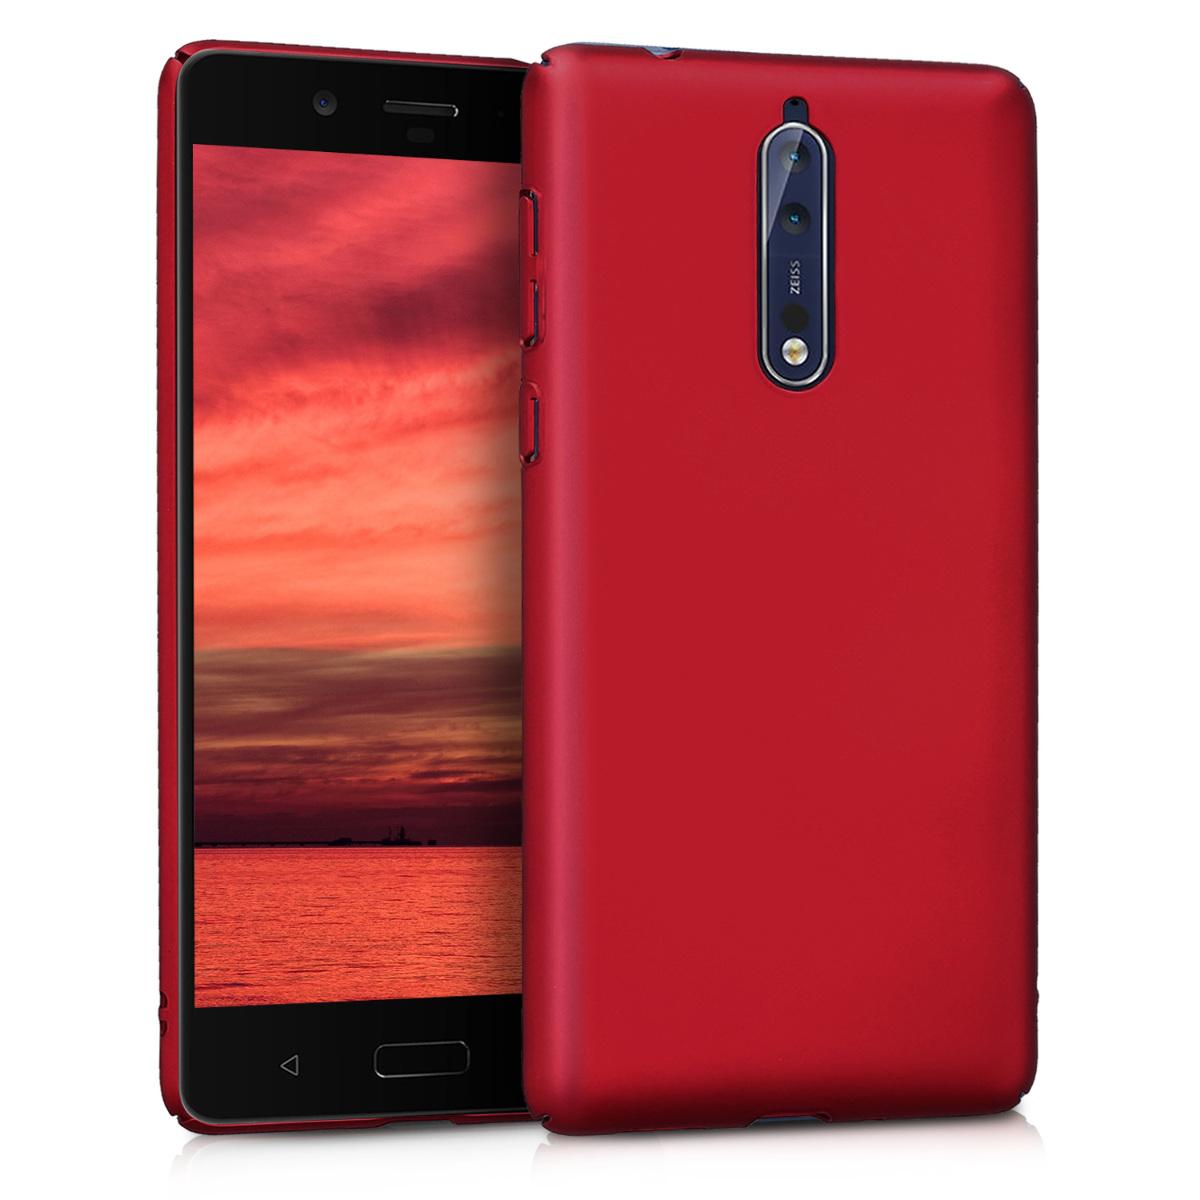 KW Slim Anti-Slip Cover - Σκληρή Θήκη Καουτσούκ Nokia 8 - Dark Red (43239.20)